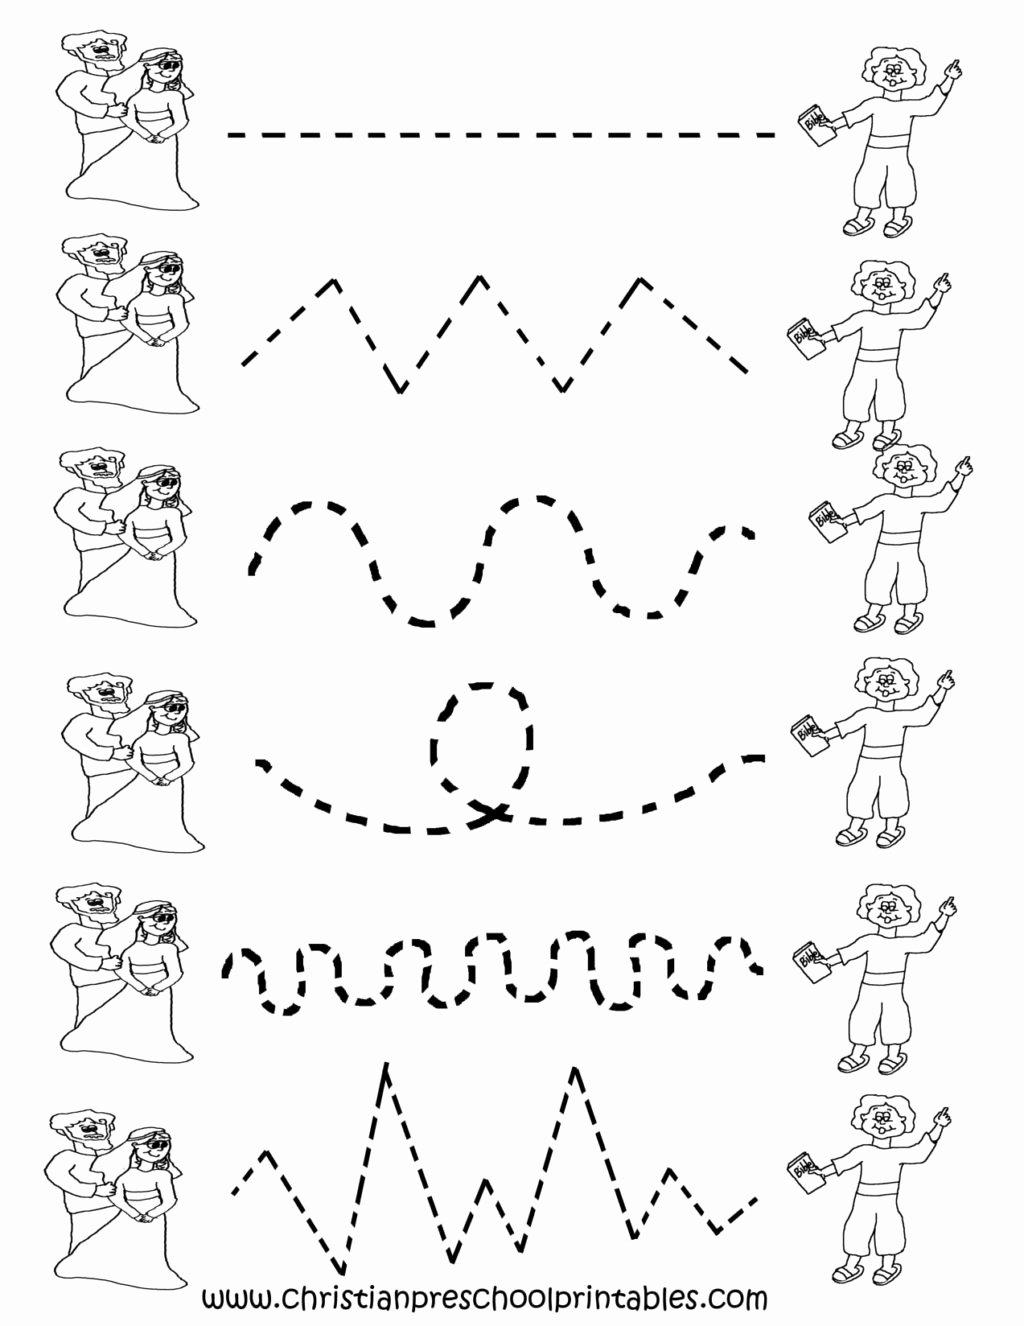 Worksheets for Preschoolers Tracing Best Of Worksheet Preschool Tracing Worksheets Cakepins